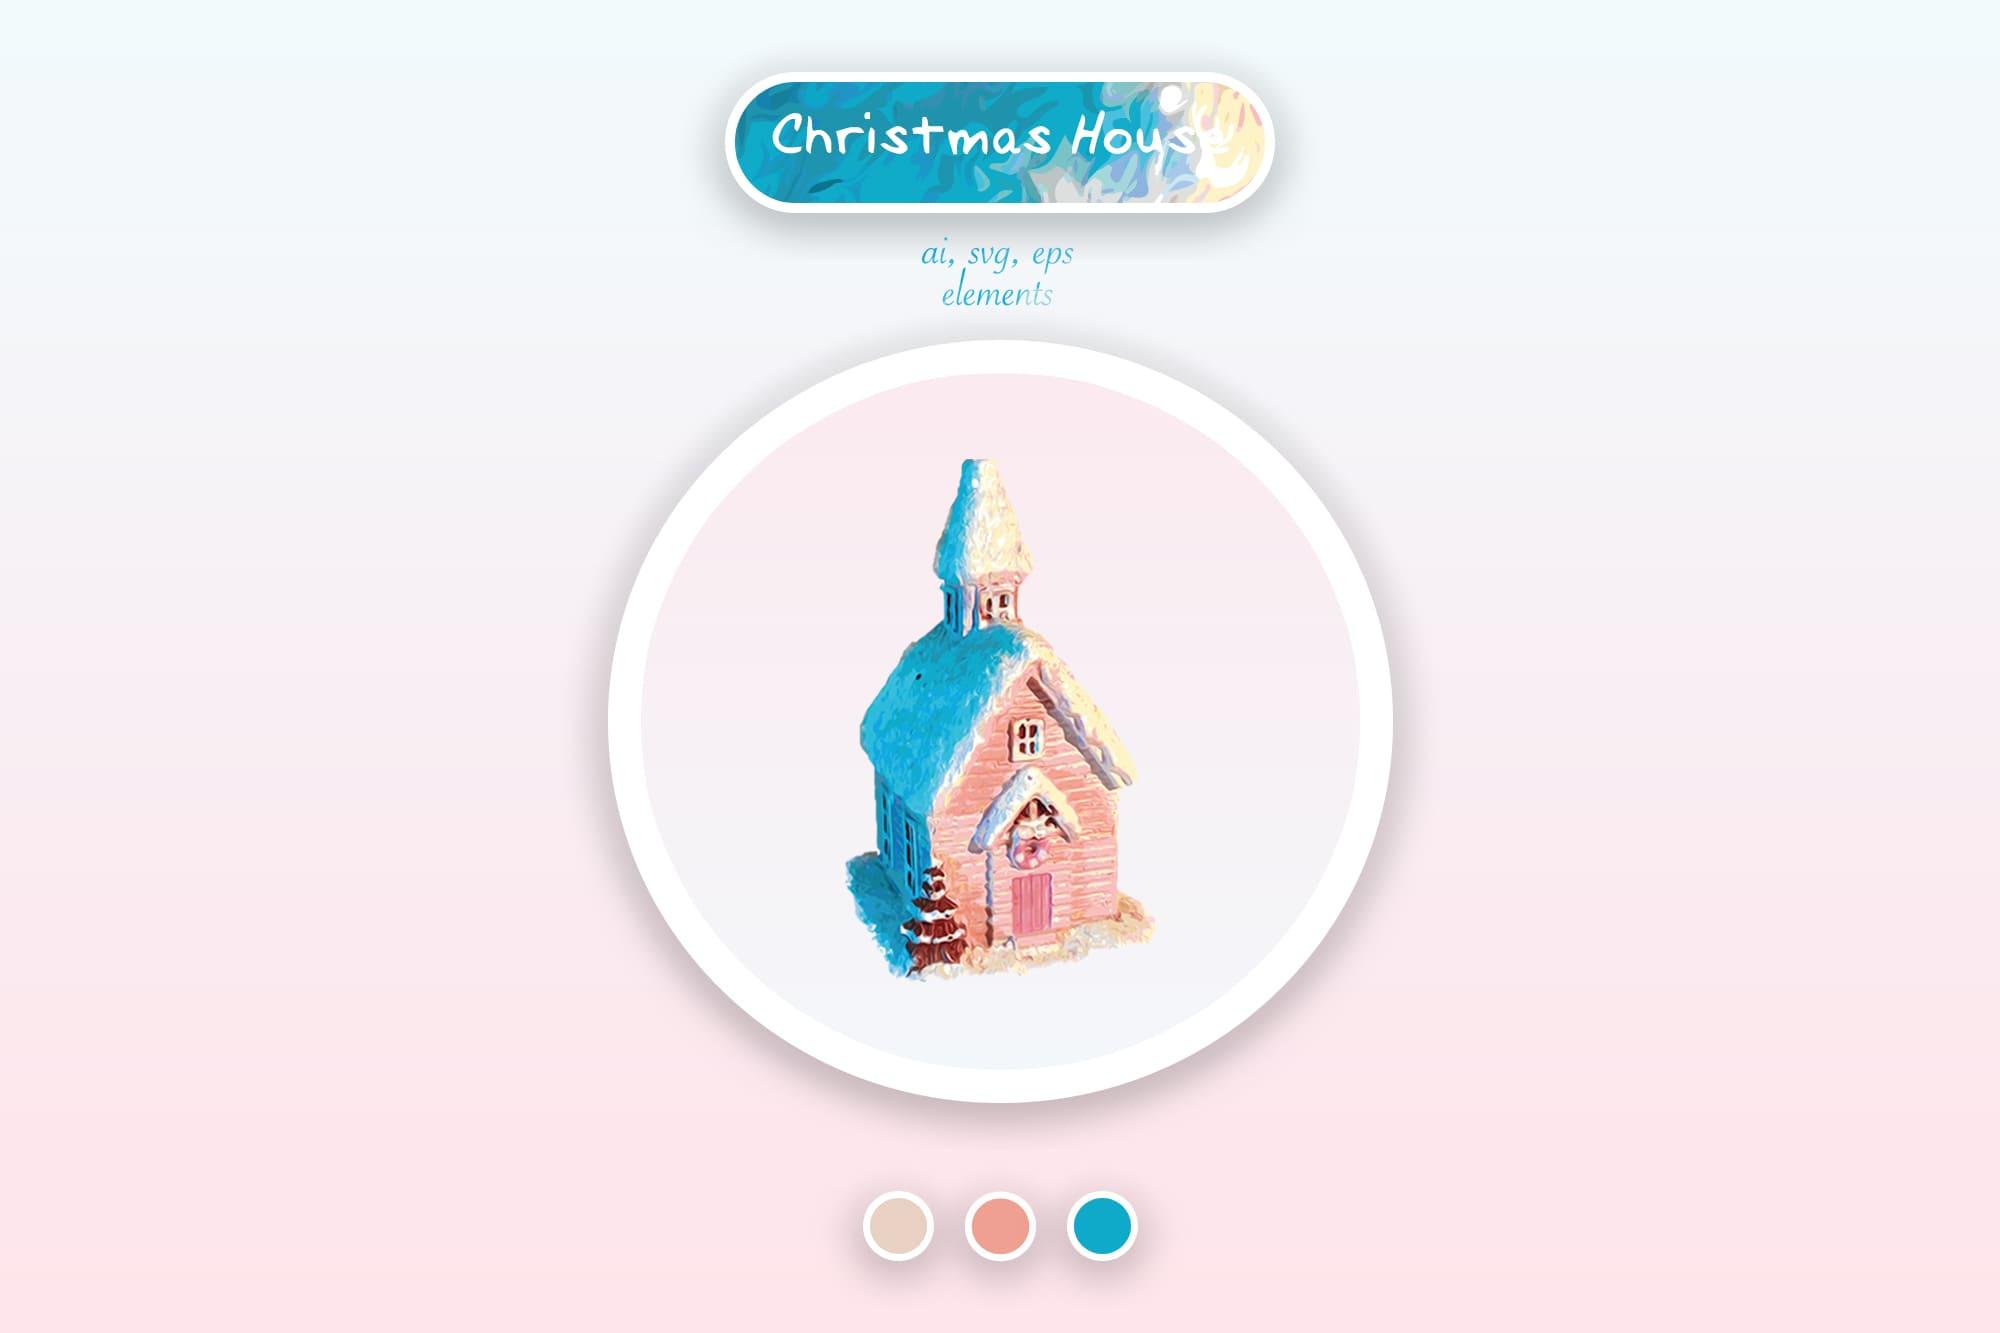 496 Christmas Illustrations: Christmas Vectors Bundle SVG, EPS, AI - Xmas time a